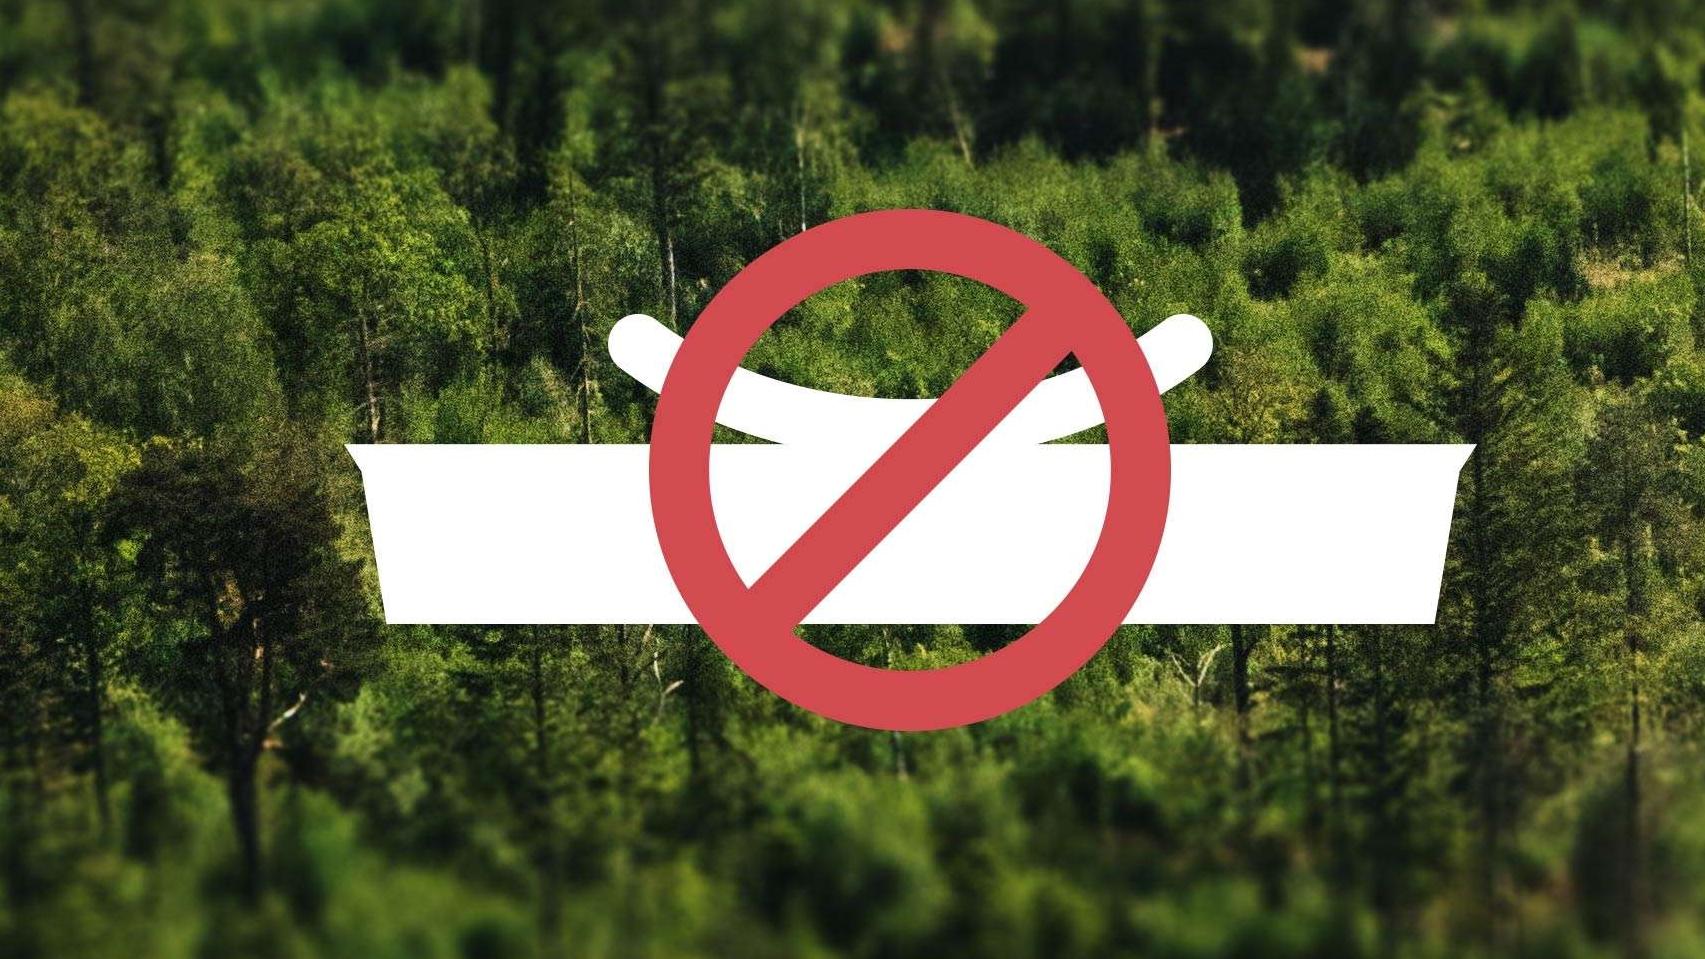 afbraendingforbud.jpg